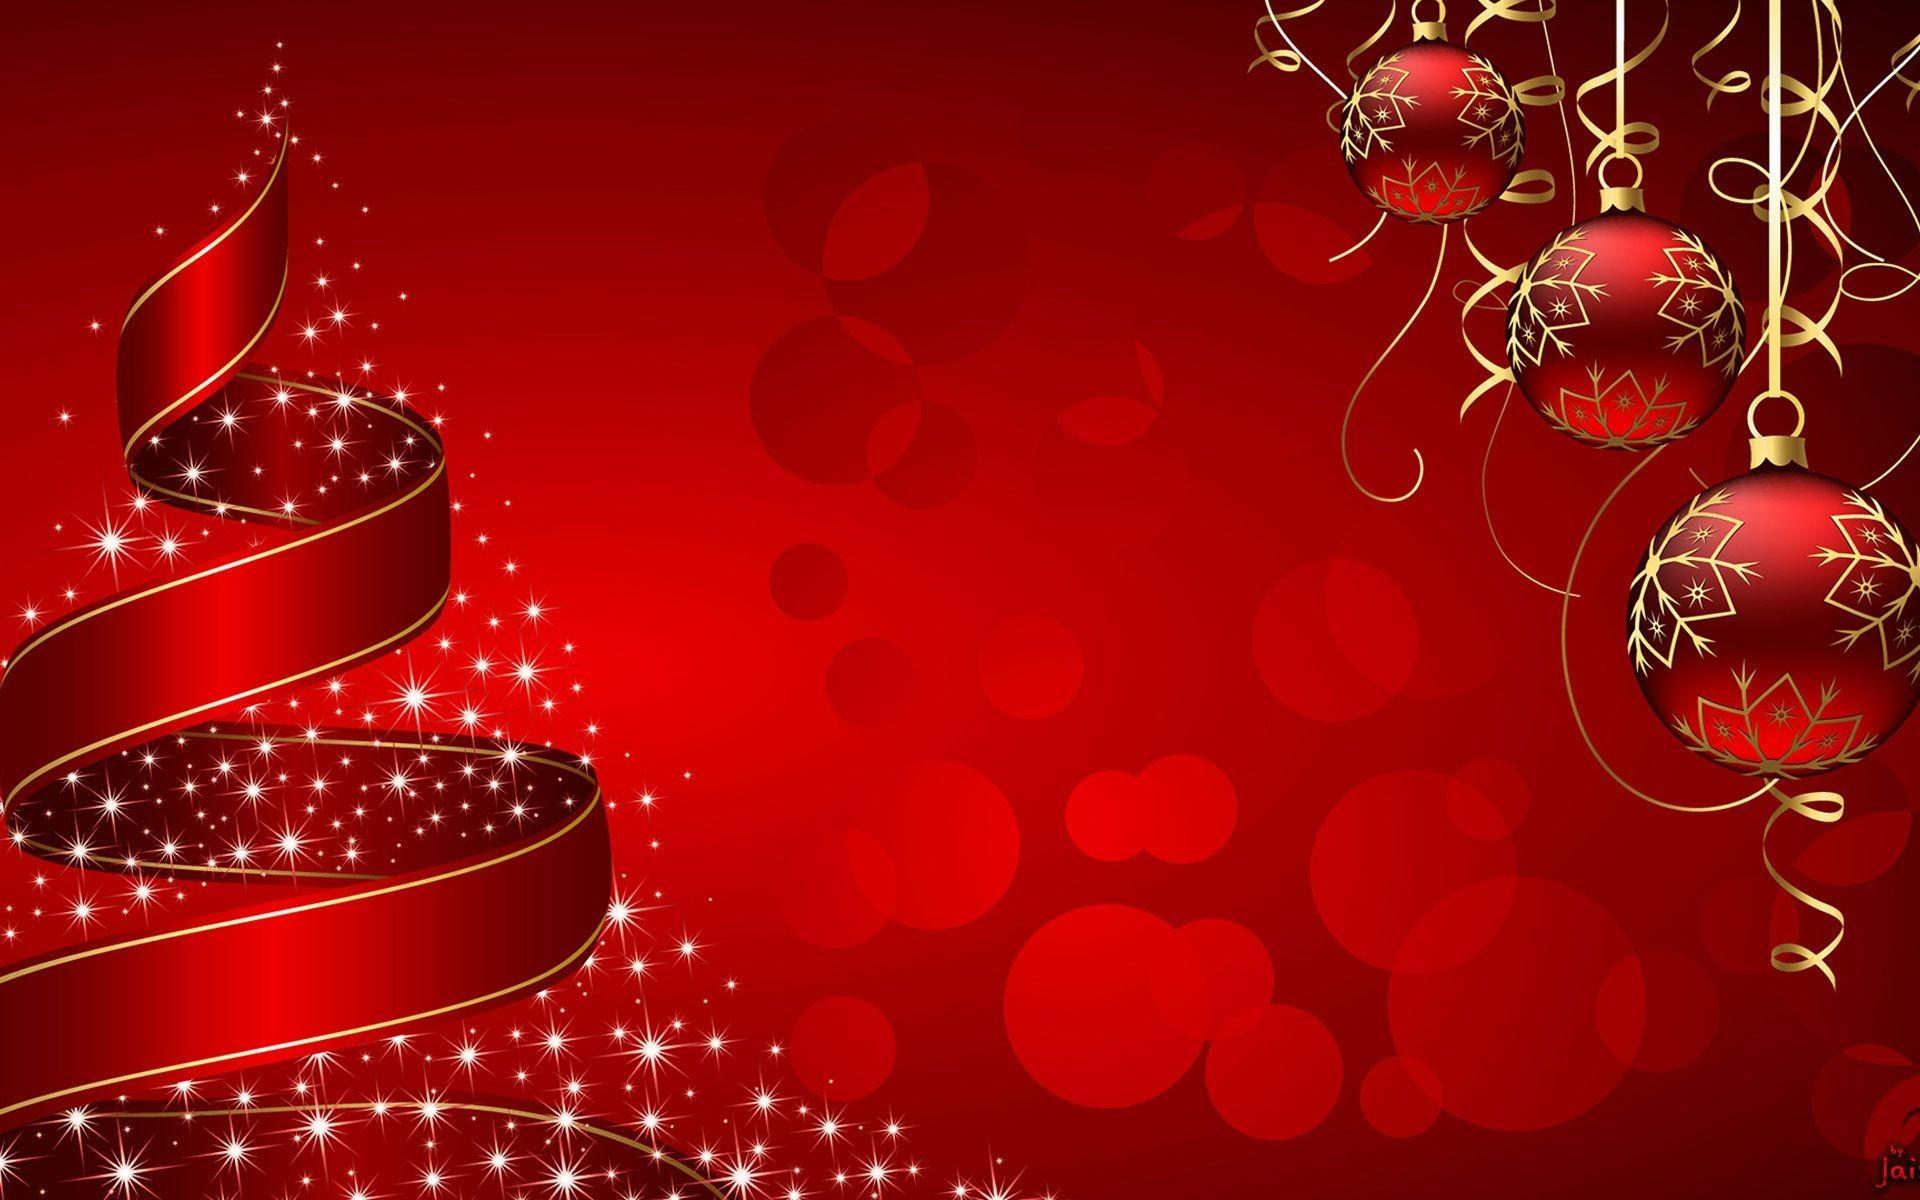 High Quality Free Christmas Wallpaper | Full HD Photos